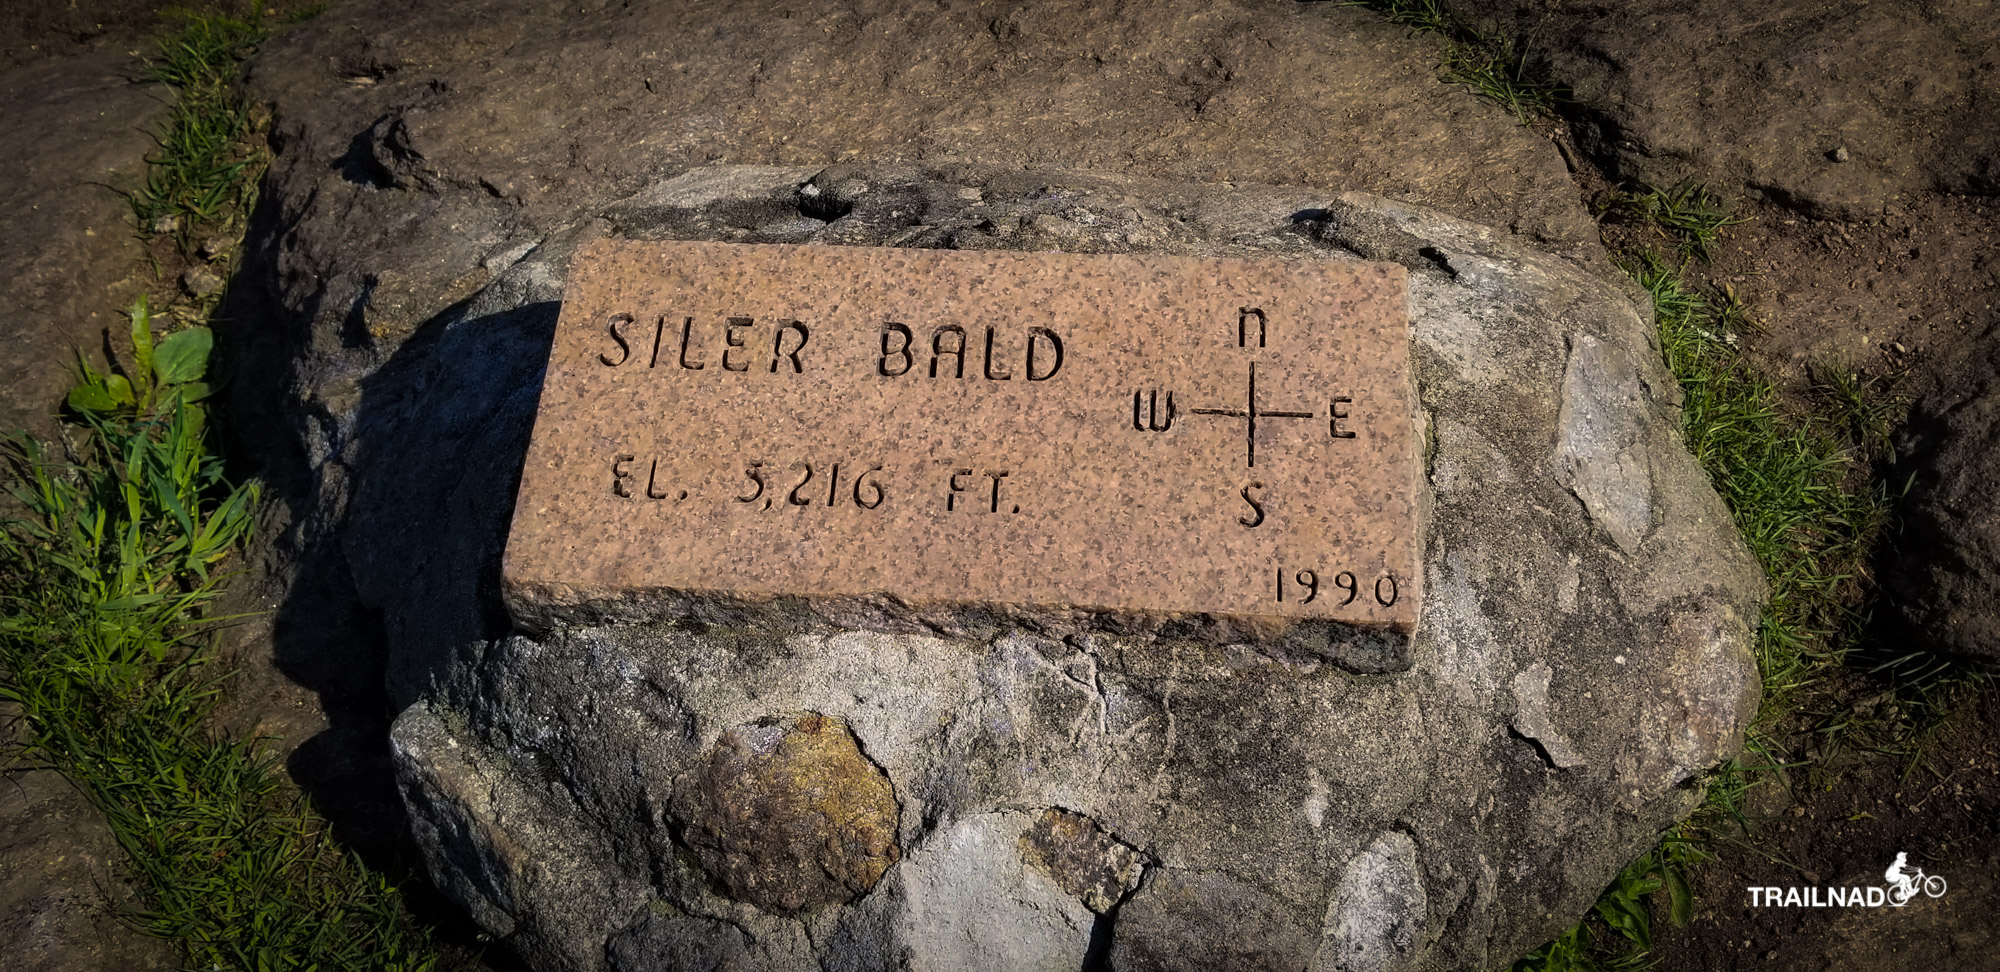 Siler Bald Plate